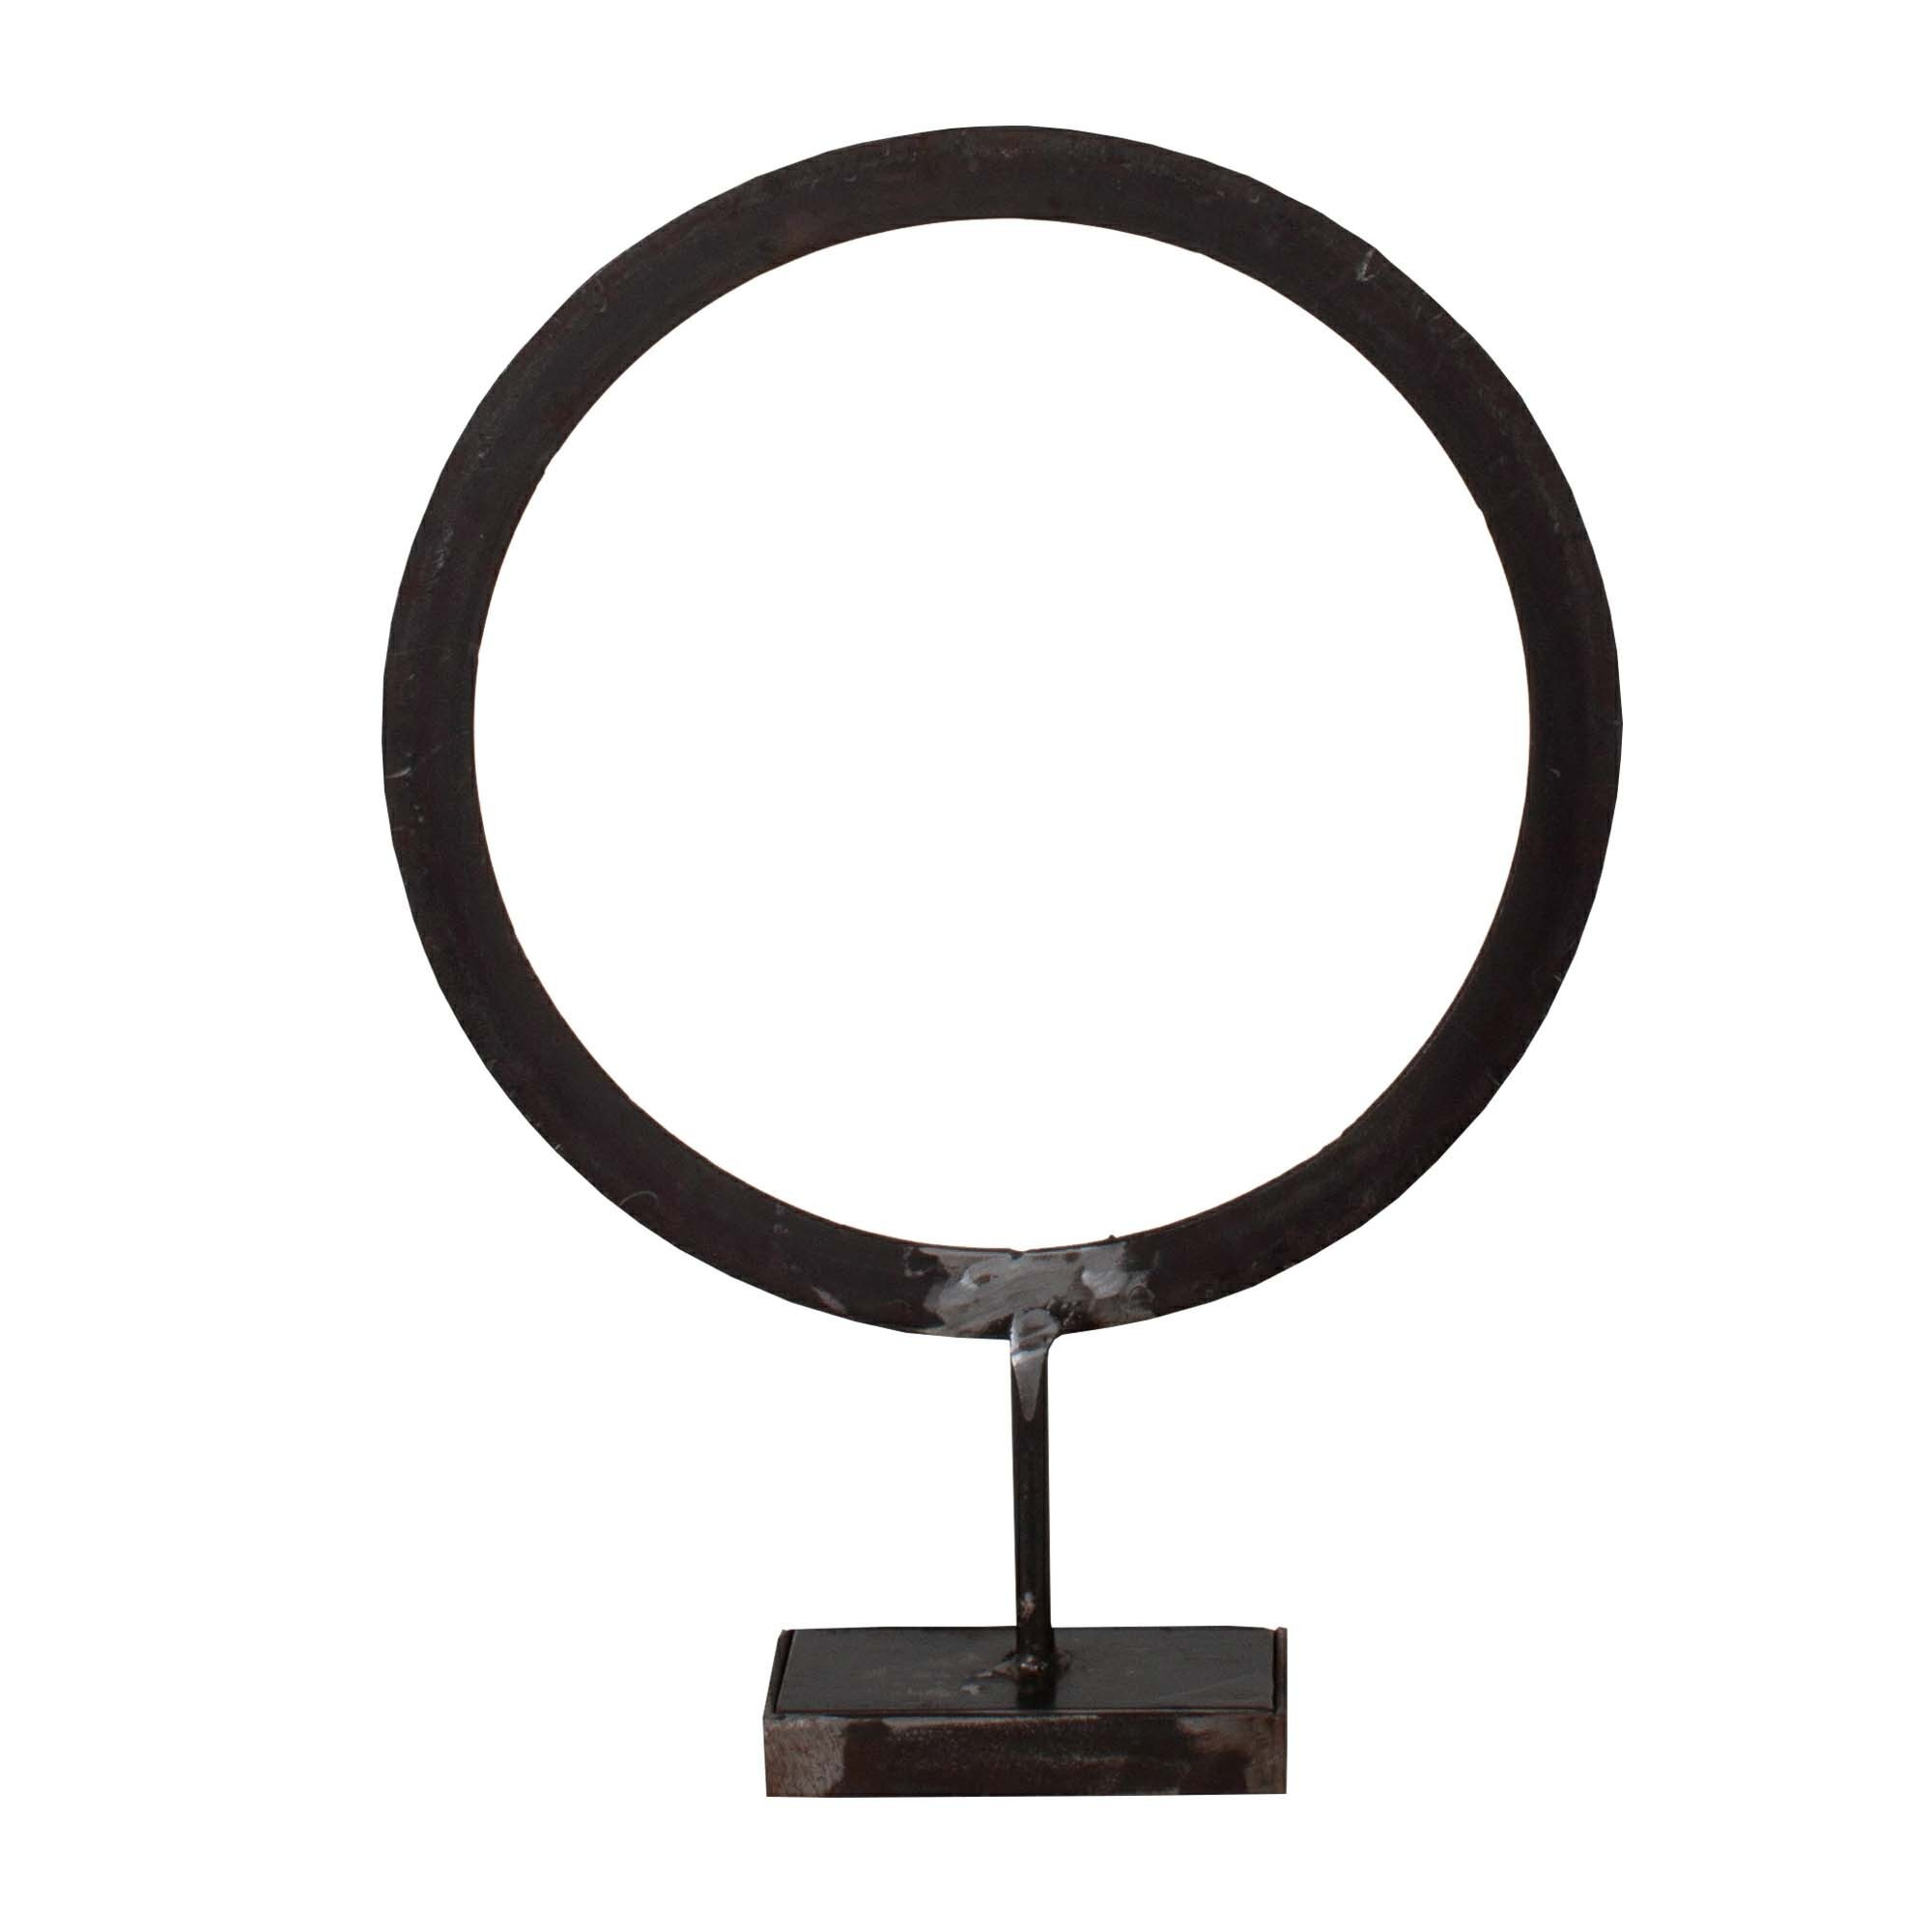 New Routz iron stand Circle